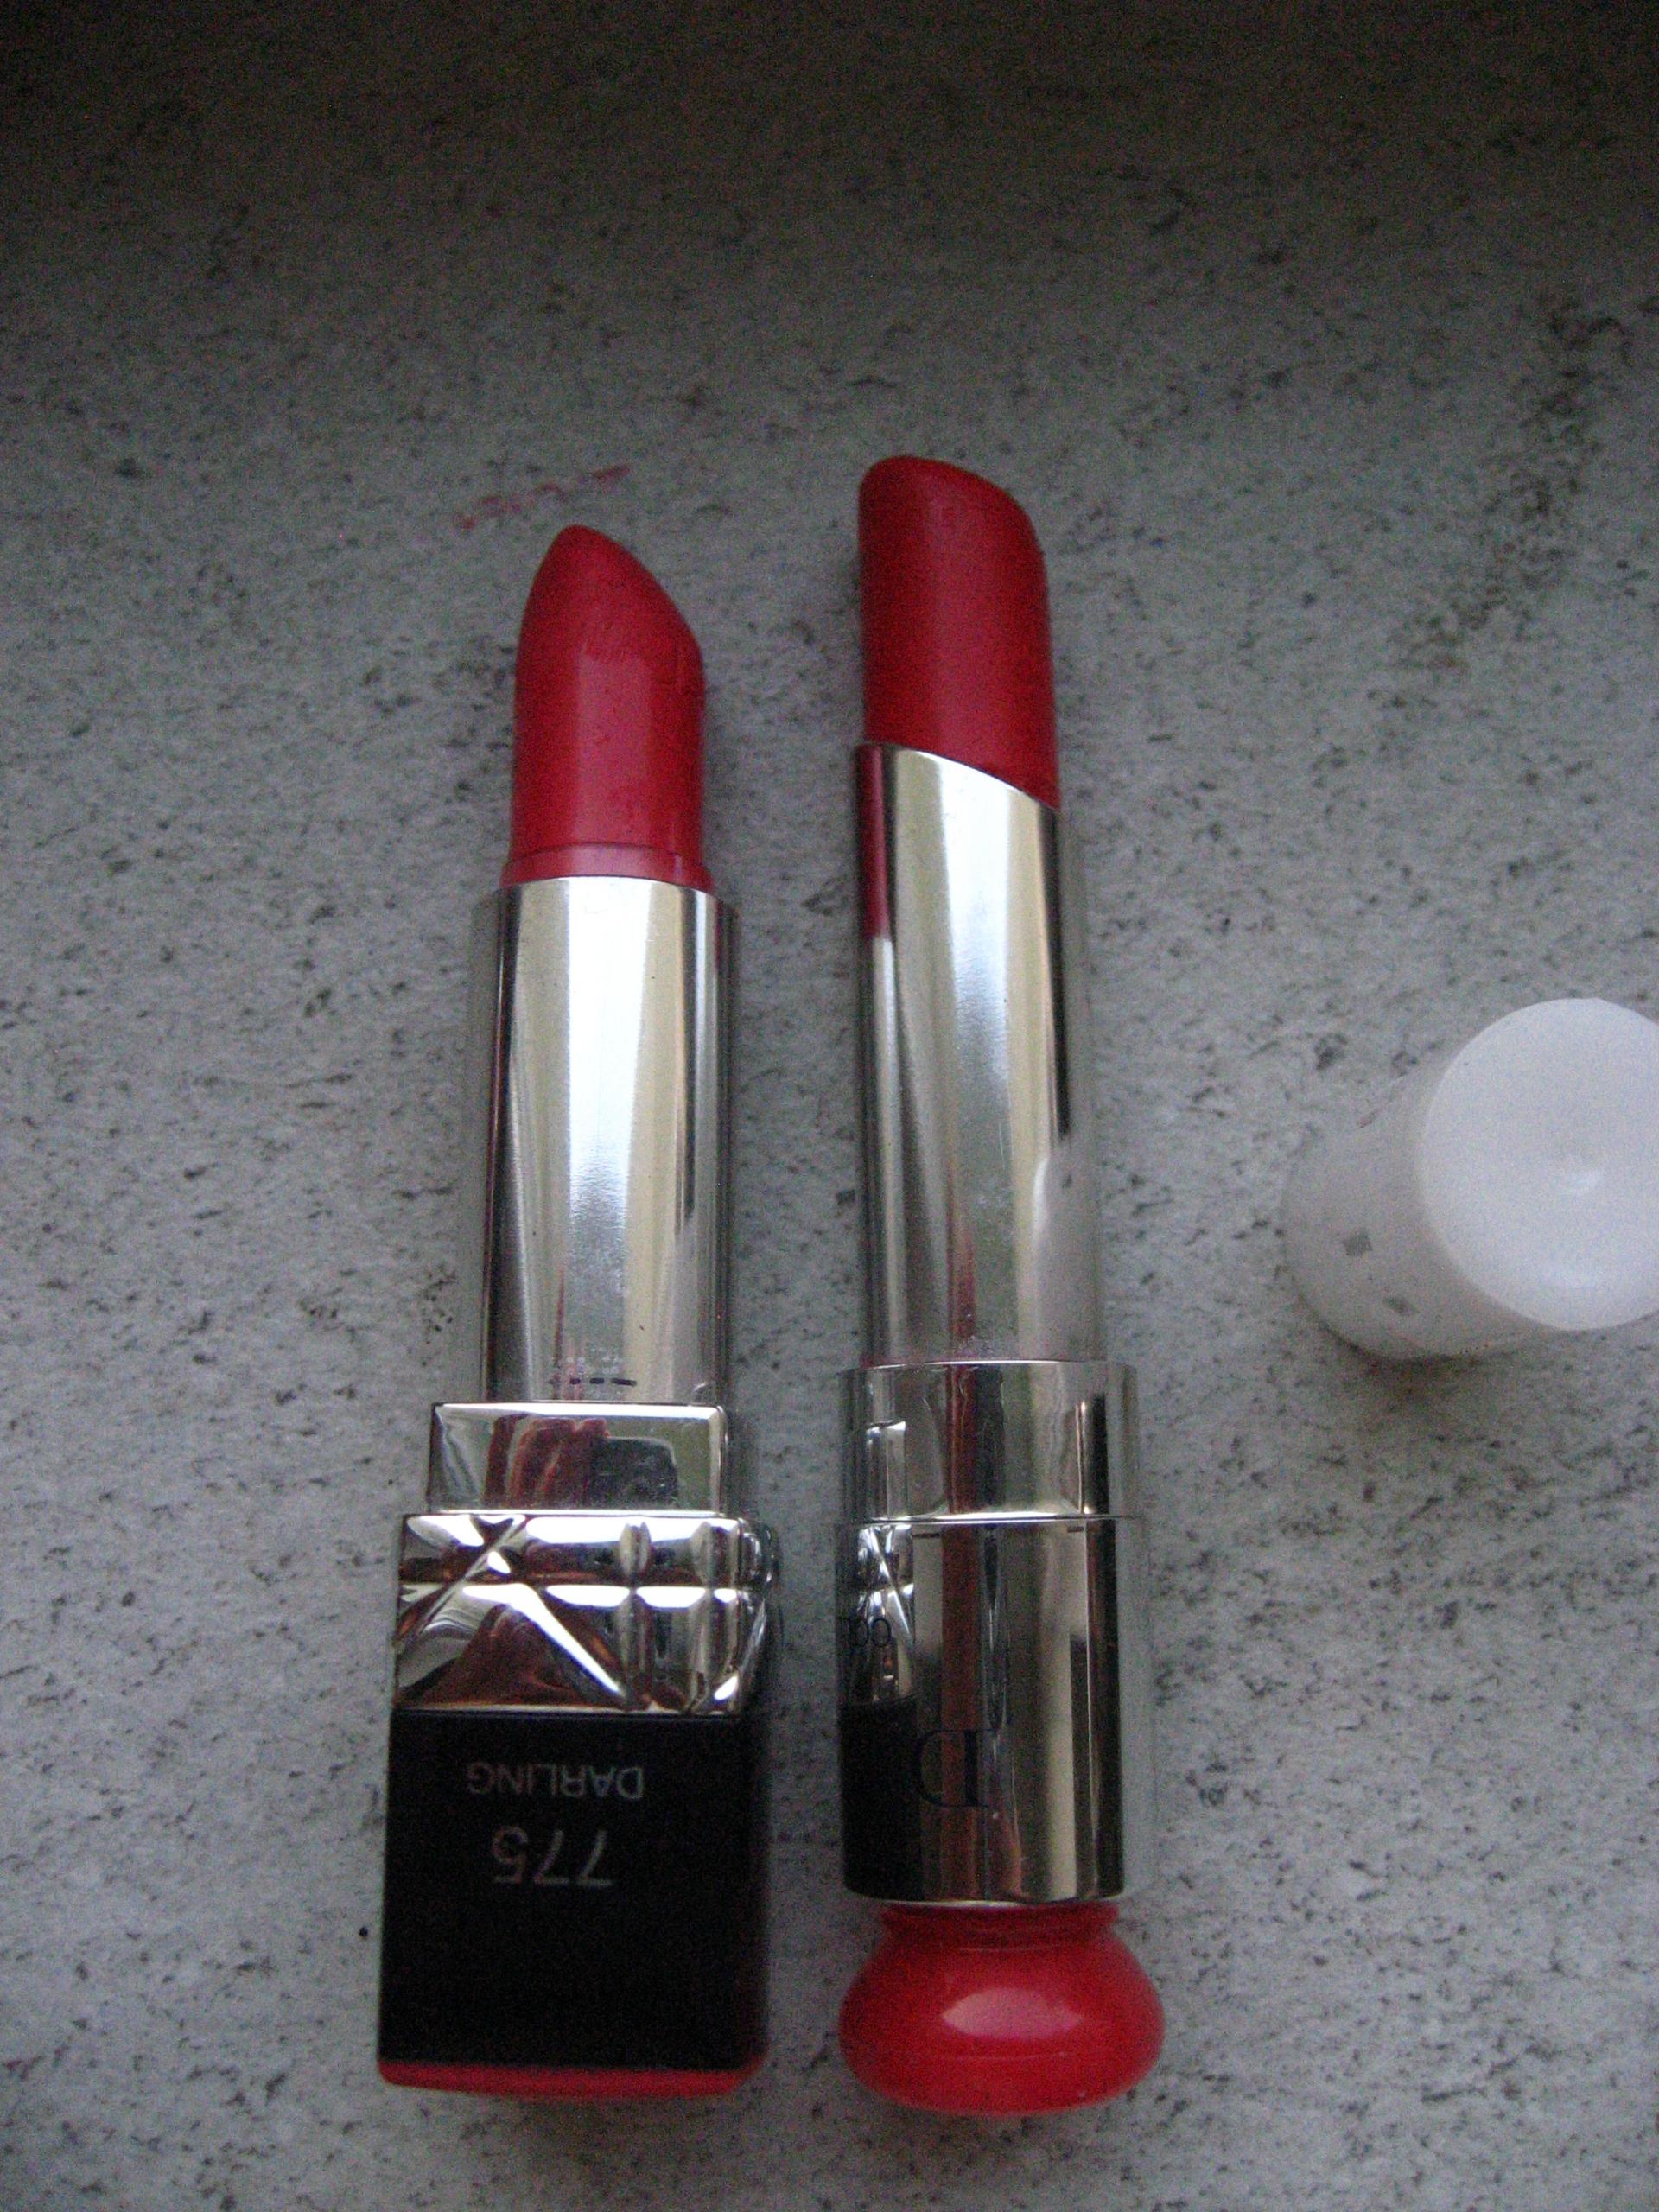 Pomadka Dior 775 + Dior 865 - zestaw